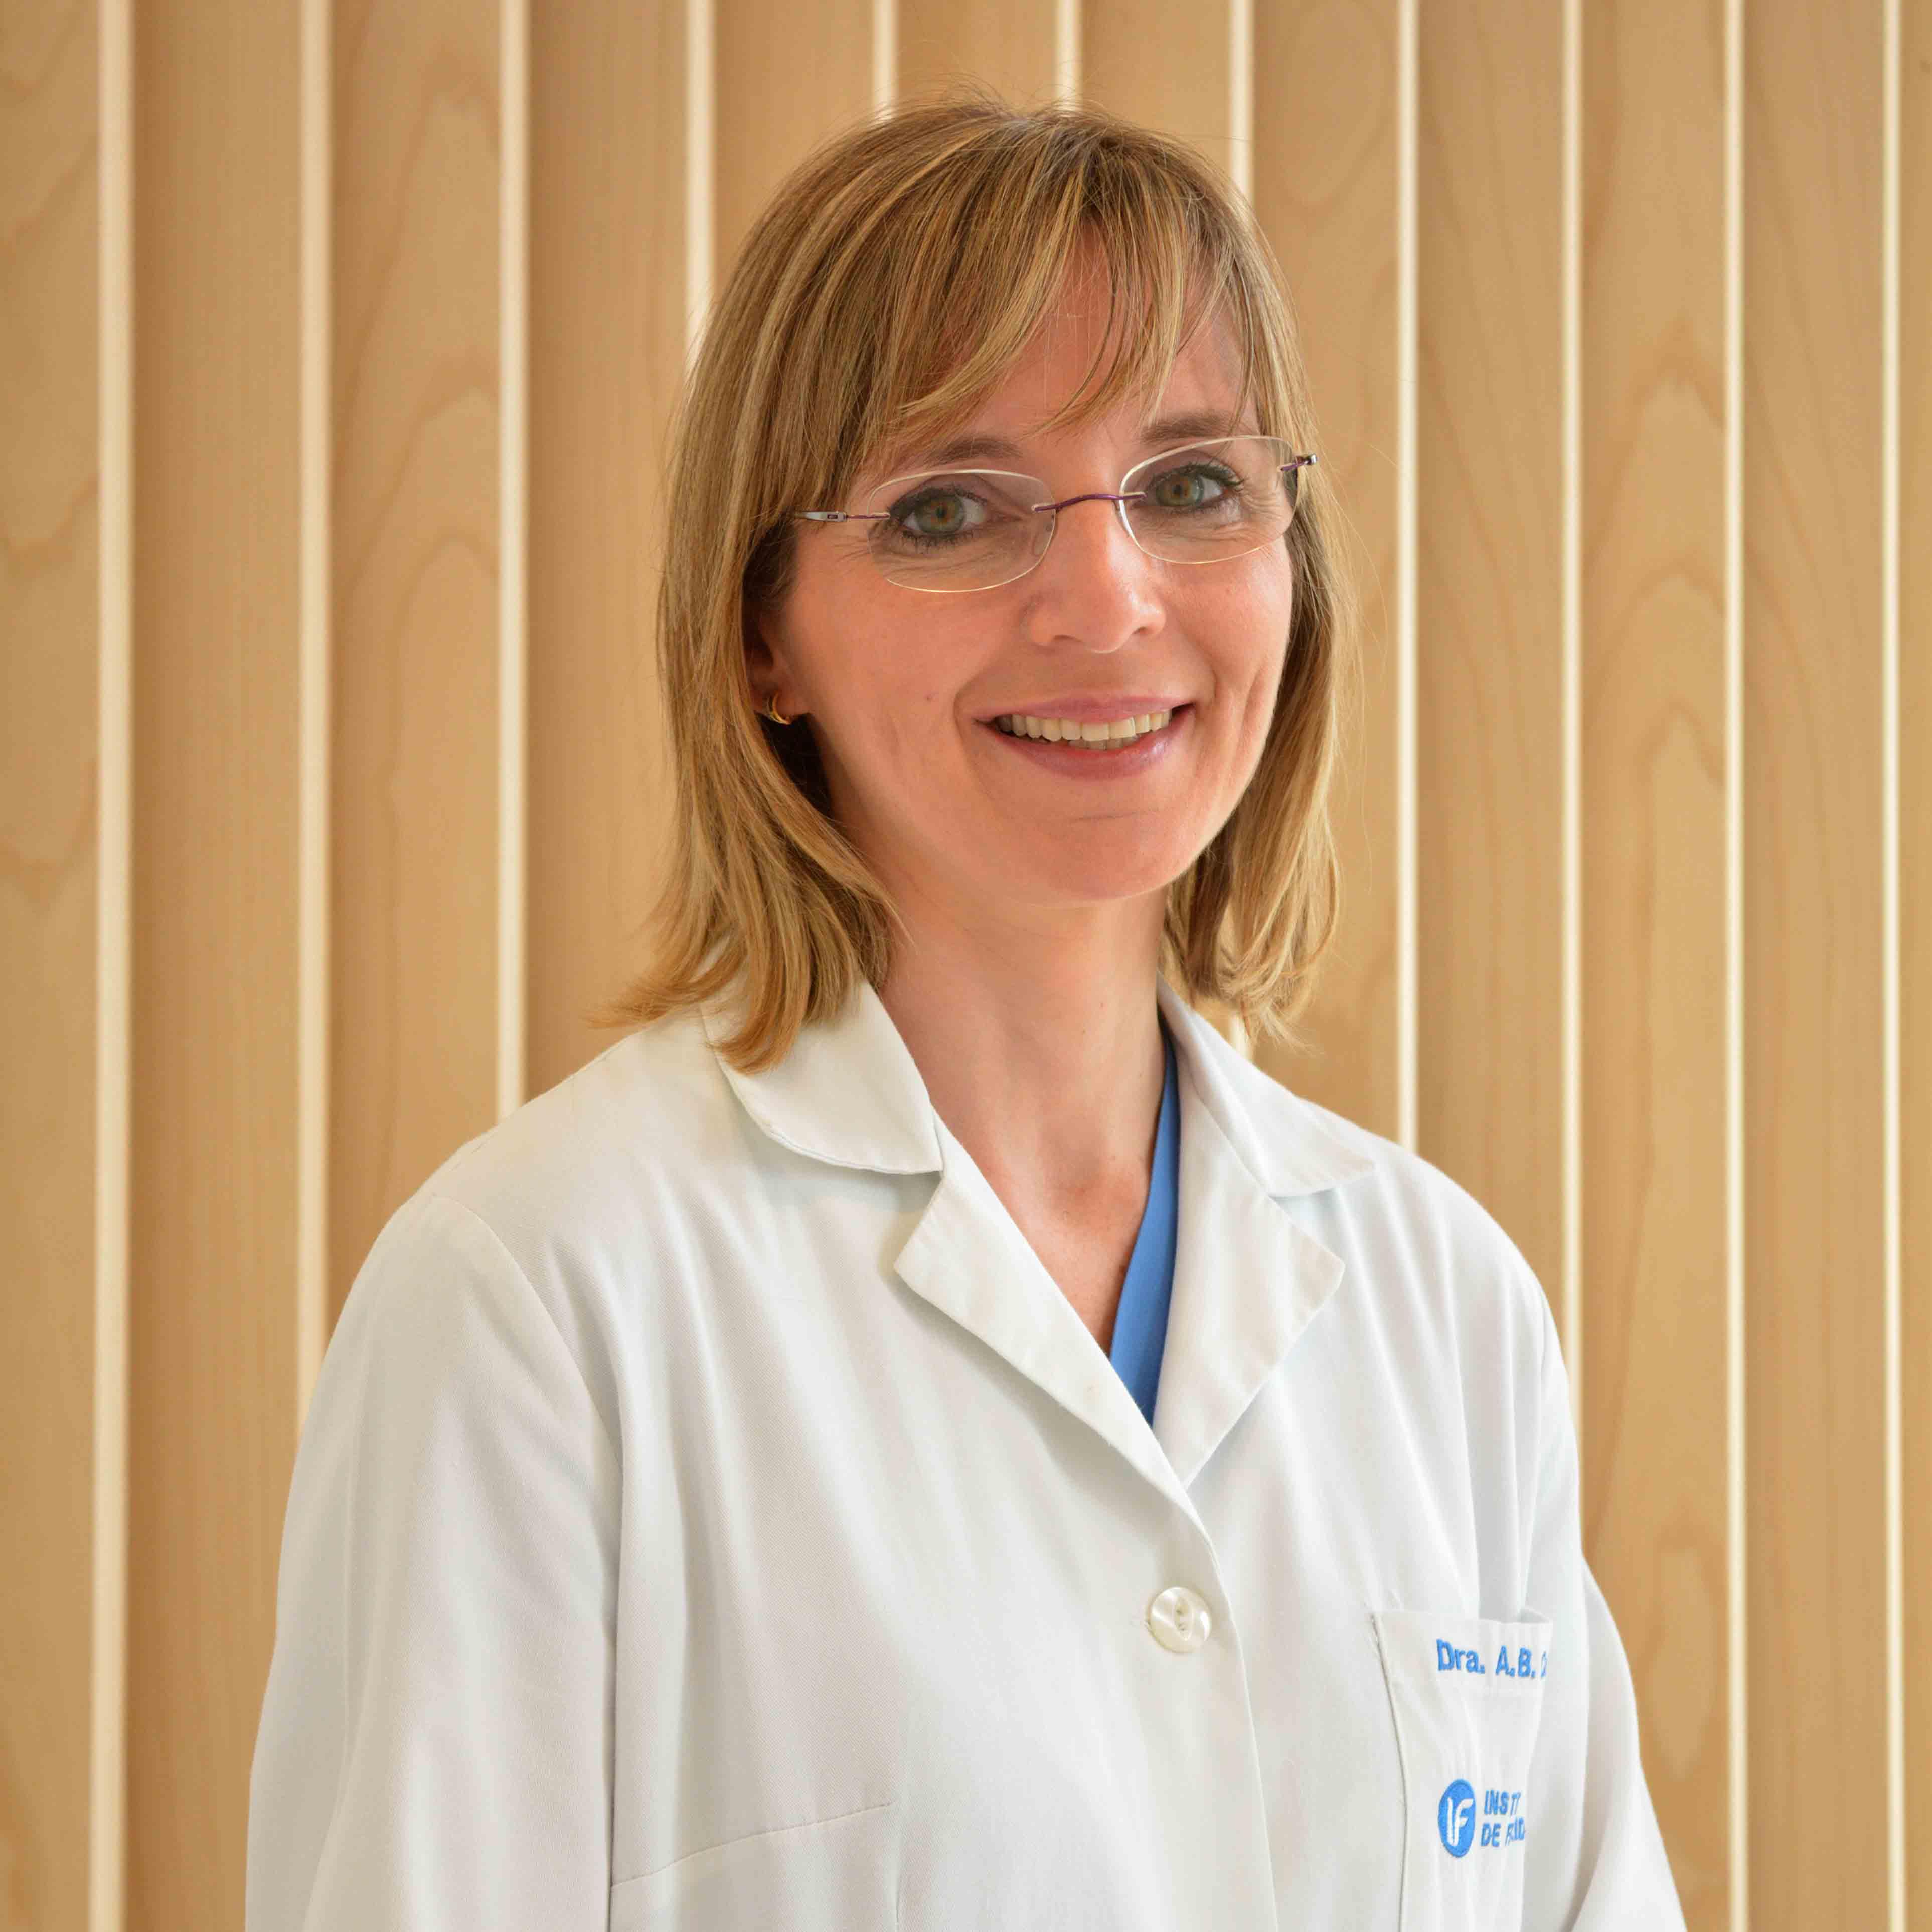 Dra. Ana Belén Castel